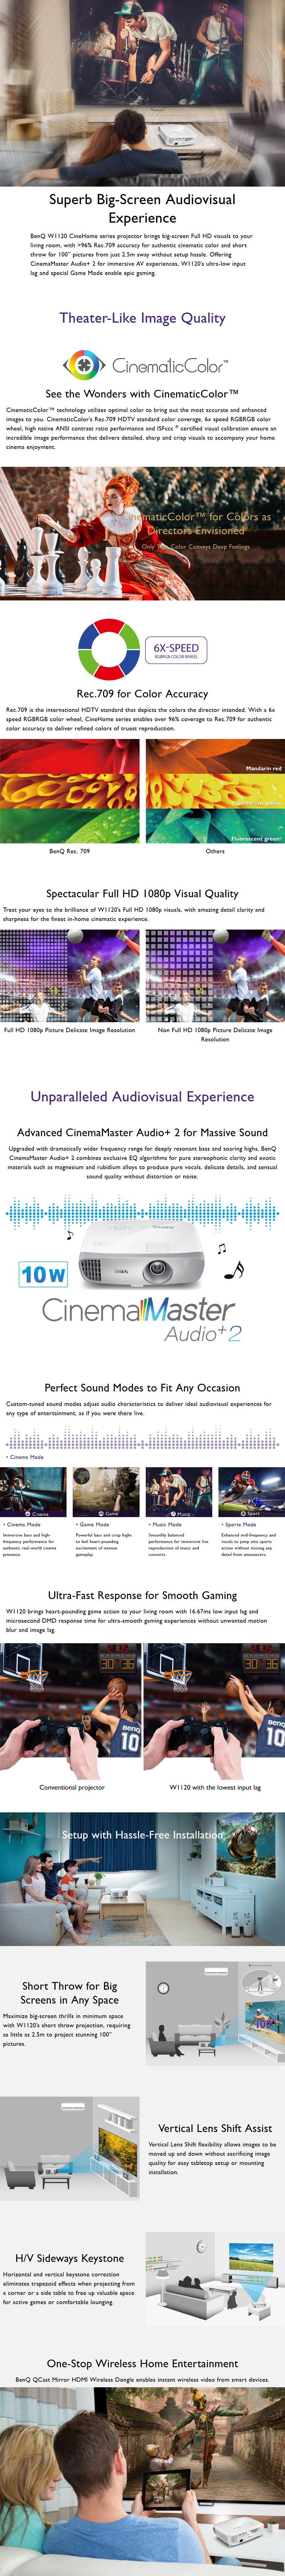 BenQ W1120 Full HD Home Theatre DLP Projector - Desktop Overview 1